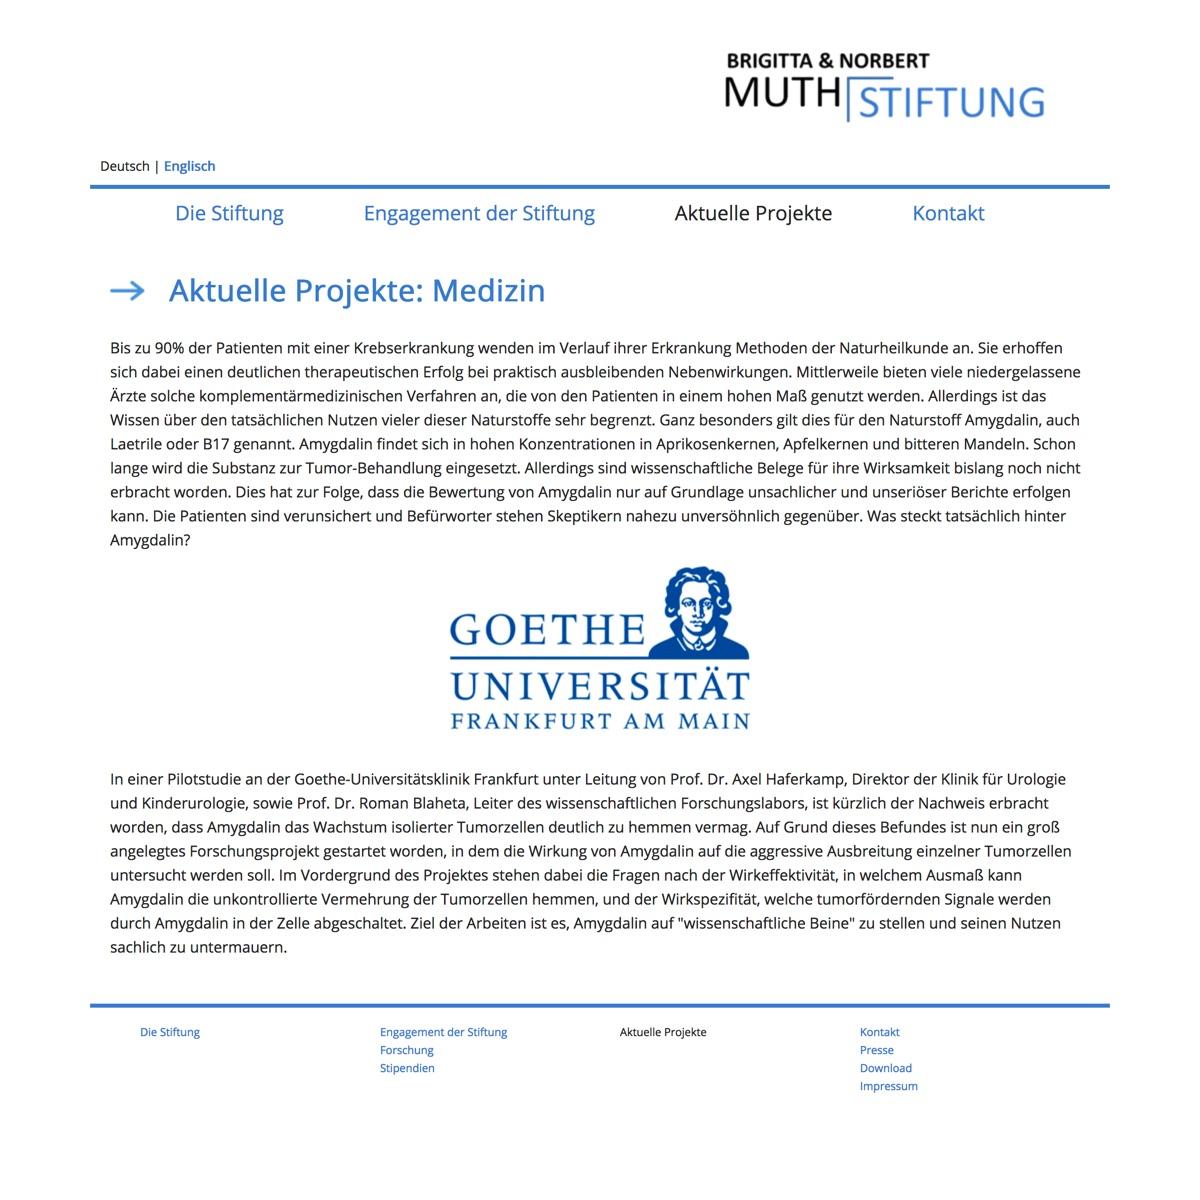 Bildschirmfoto: Homepage Muth-Stiftung 14. Mai 2017